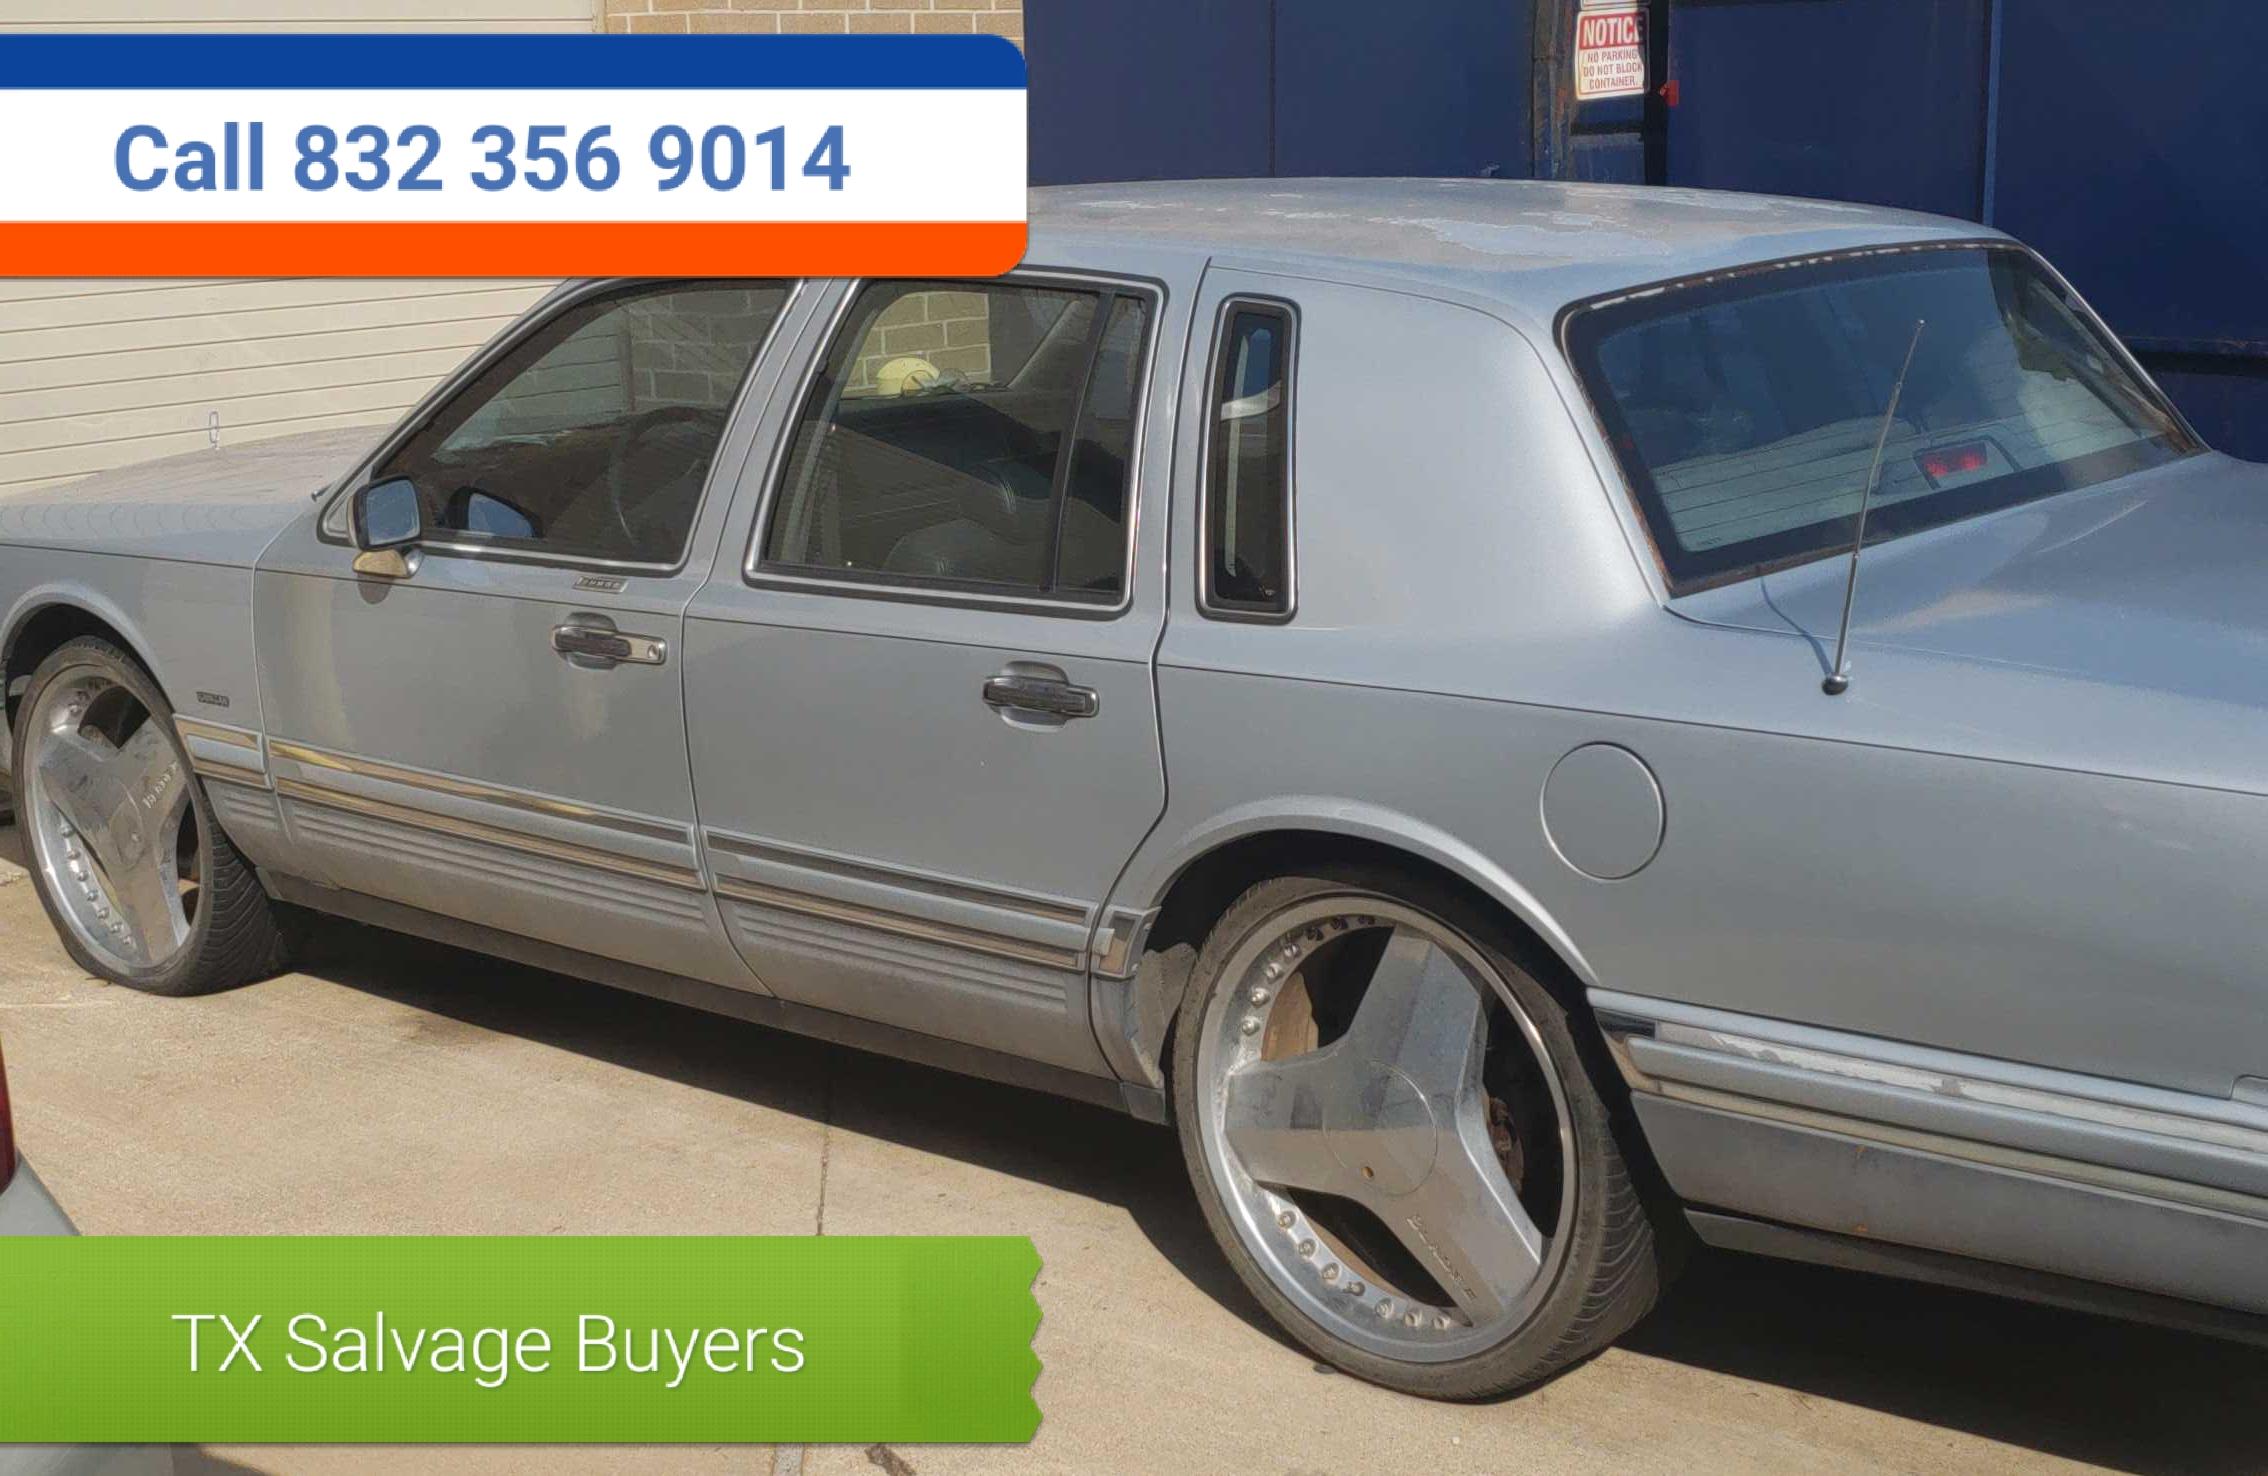 Houston Junk Car 832 356 9014 Junk Car Houston